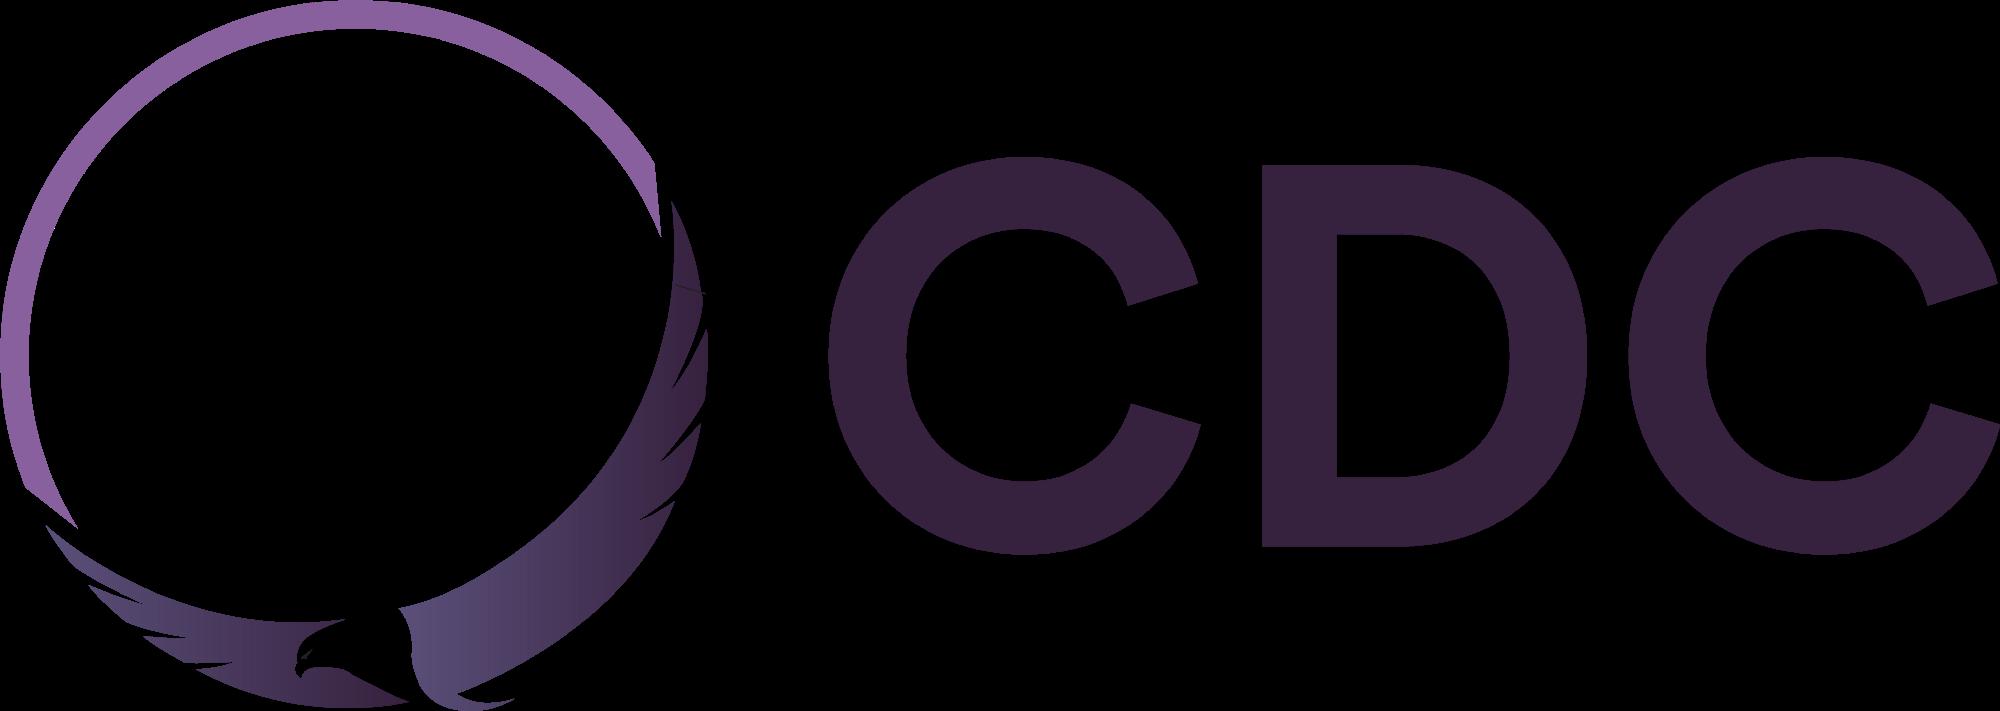 Cdc our manifesto university. Document clipart covenant